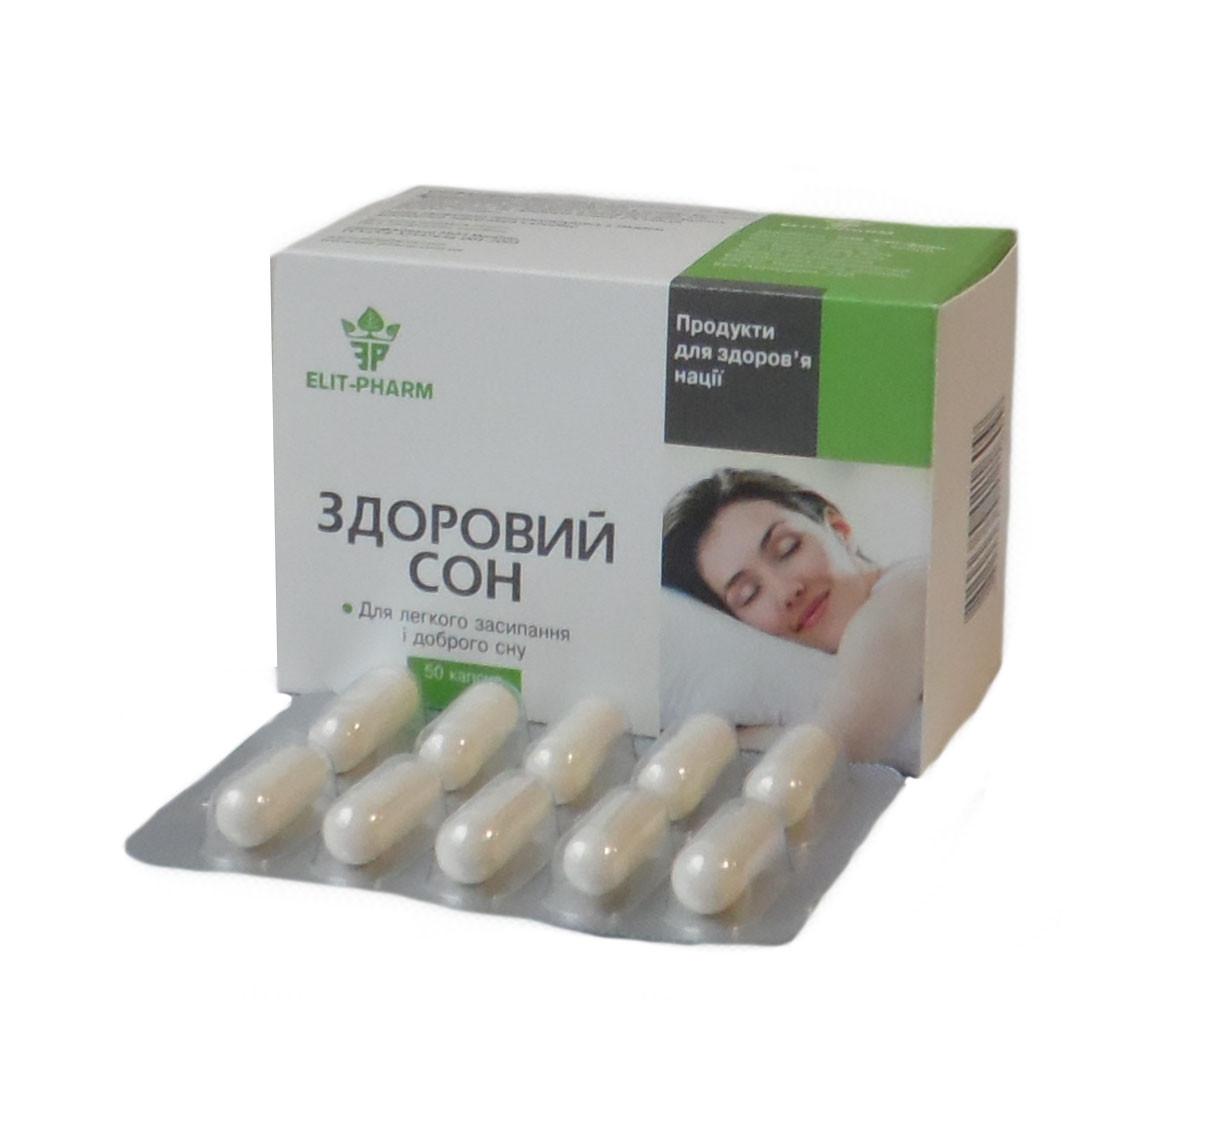 БАД Здоровый сон средство от бессонницы 50 капсул Элитфарм